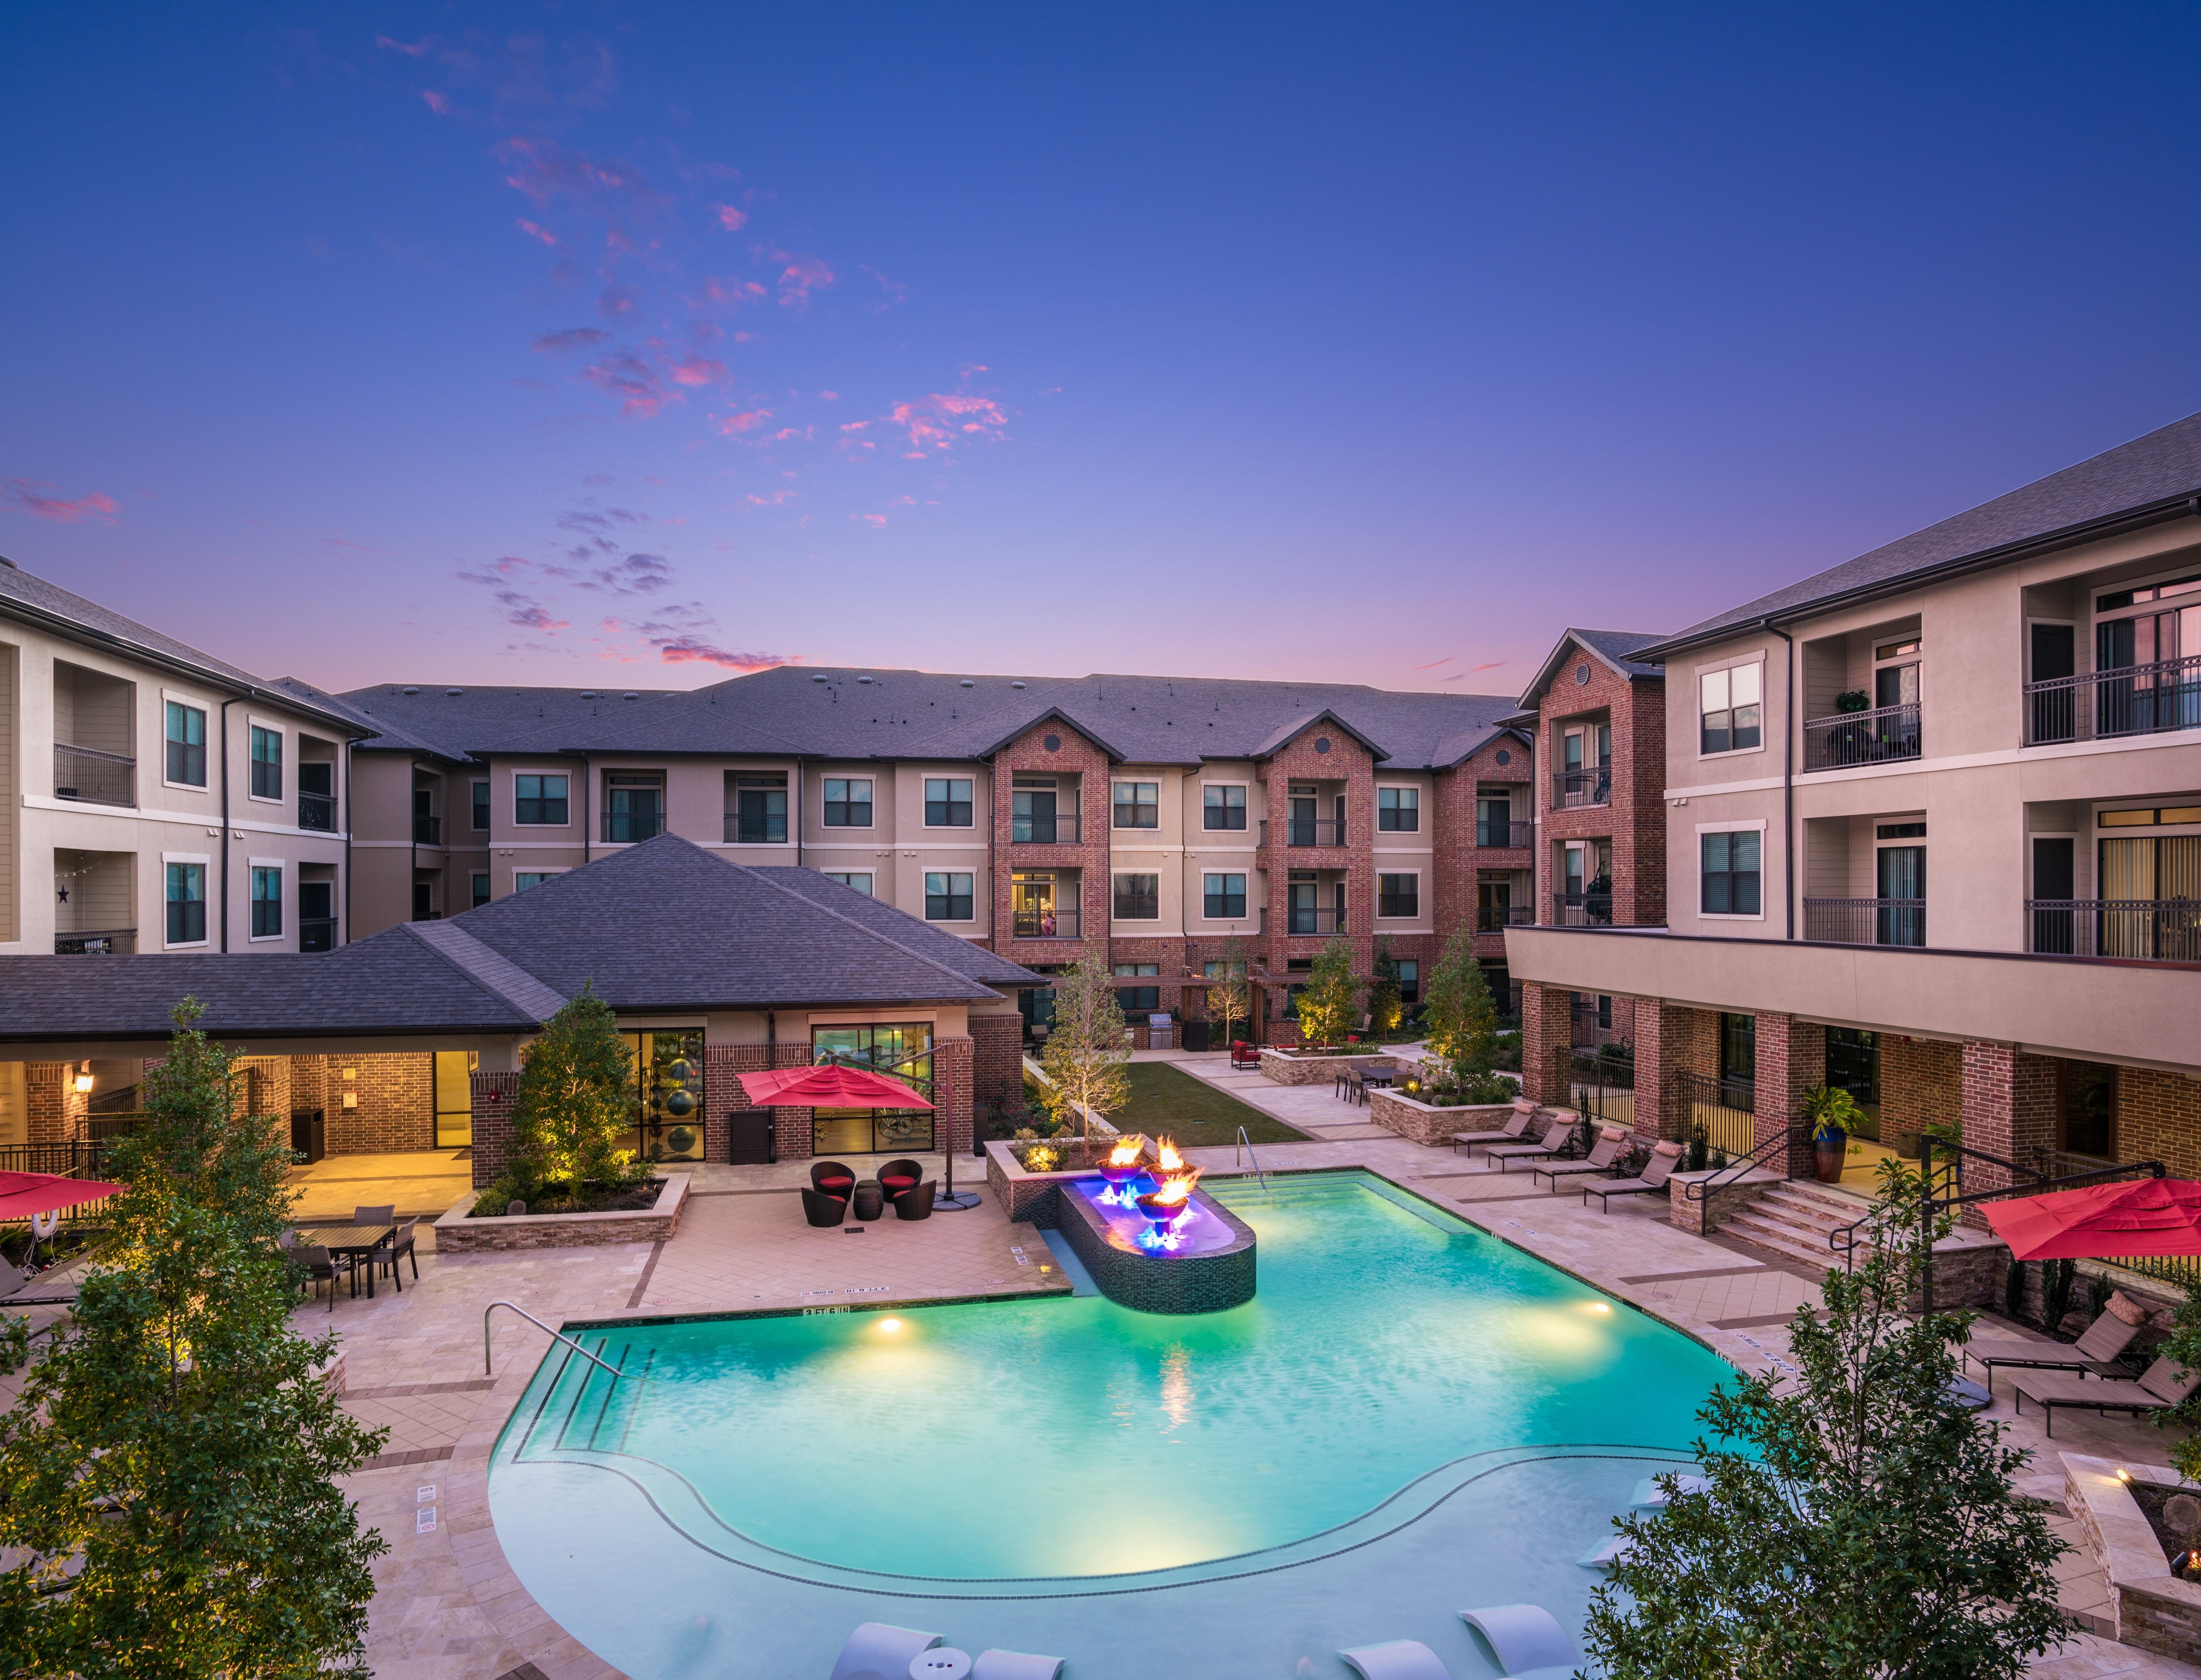 Broadstone Sierra Pines for rent